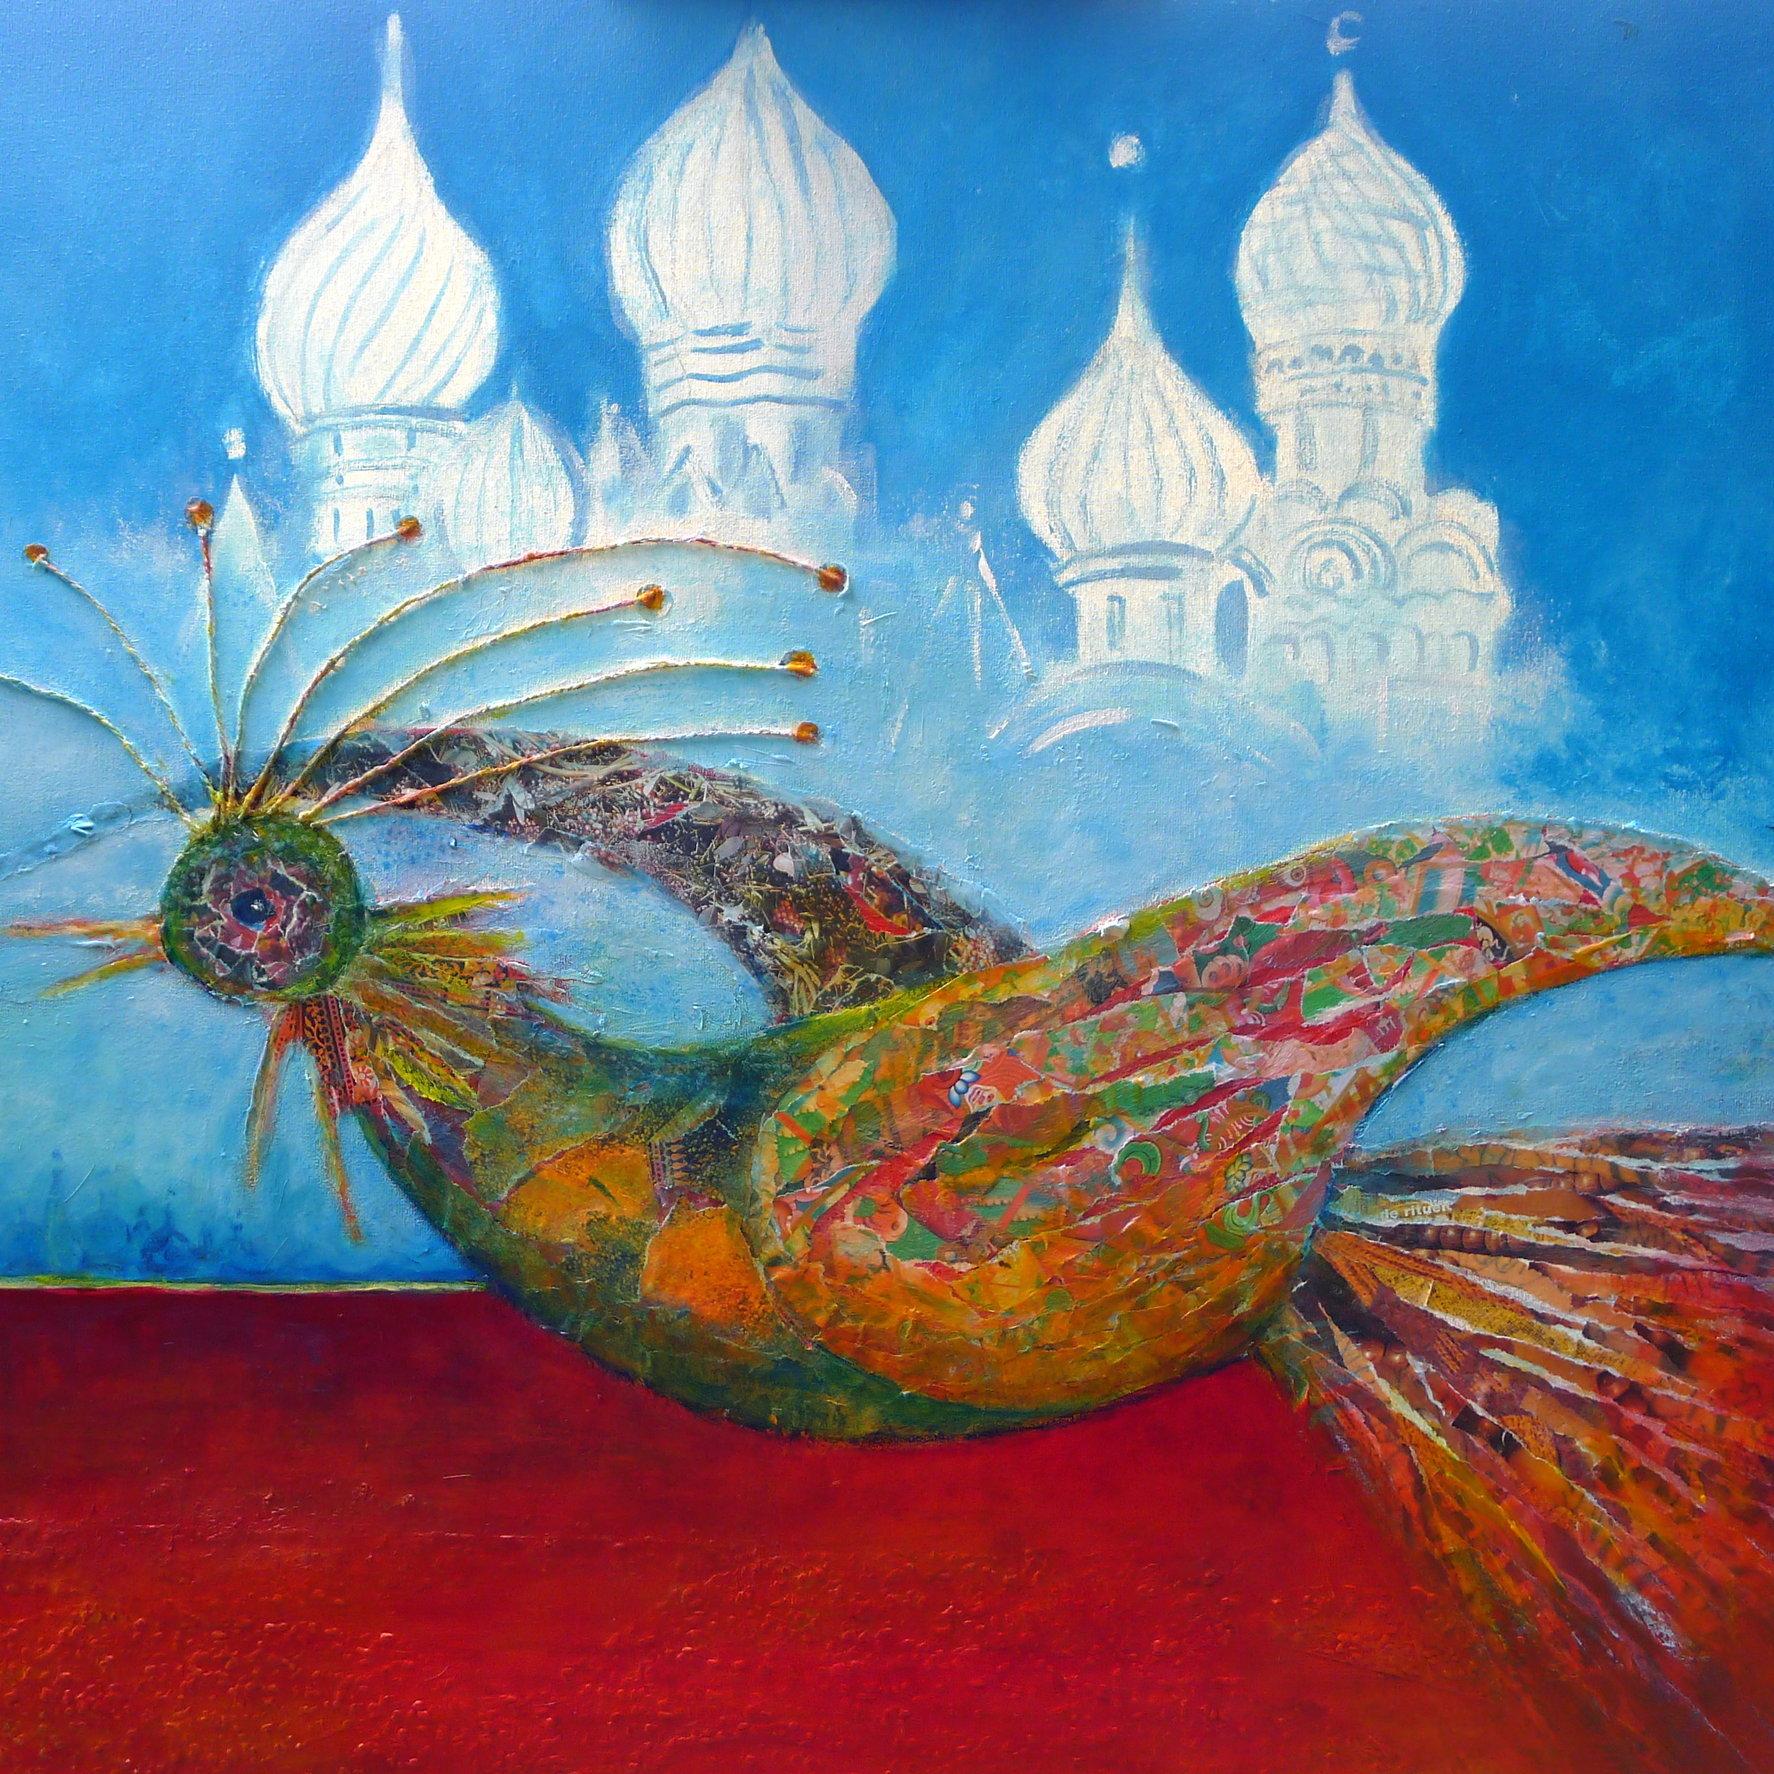 vuurvogel acryl-linnen 70 x 70.JPG